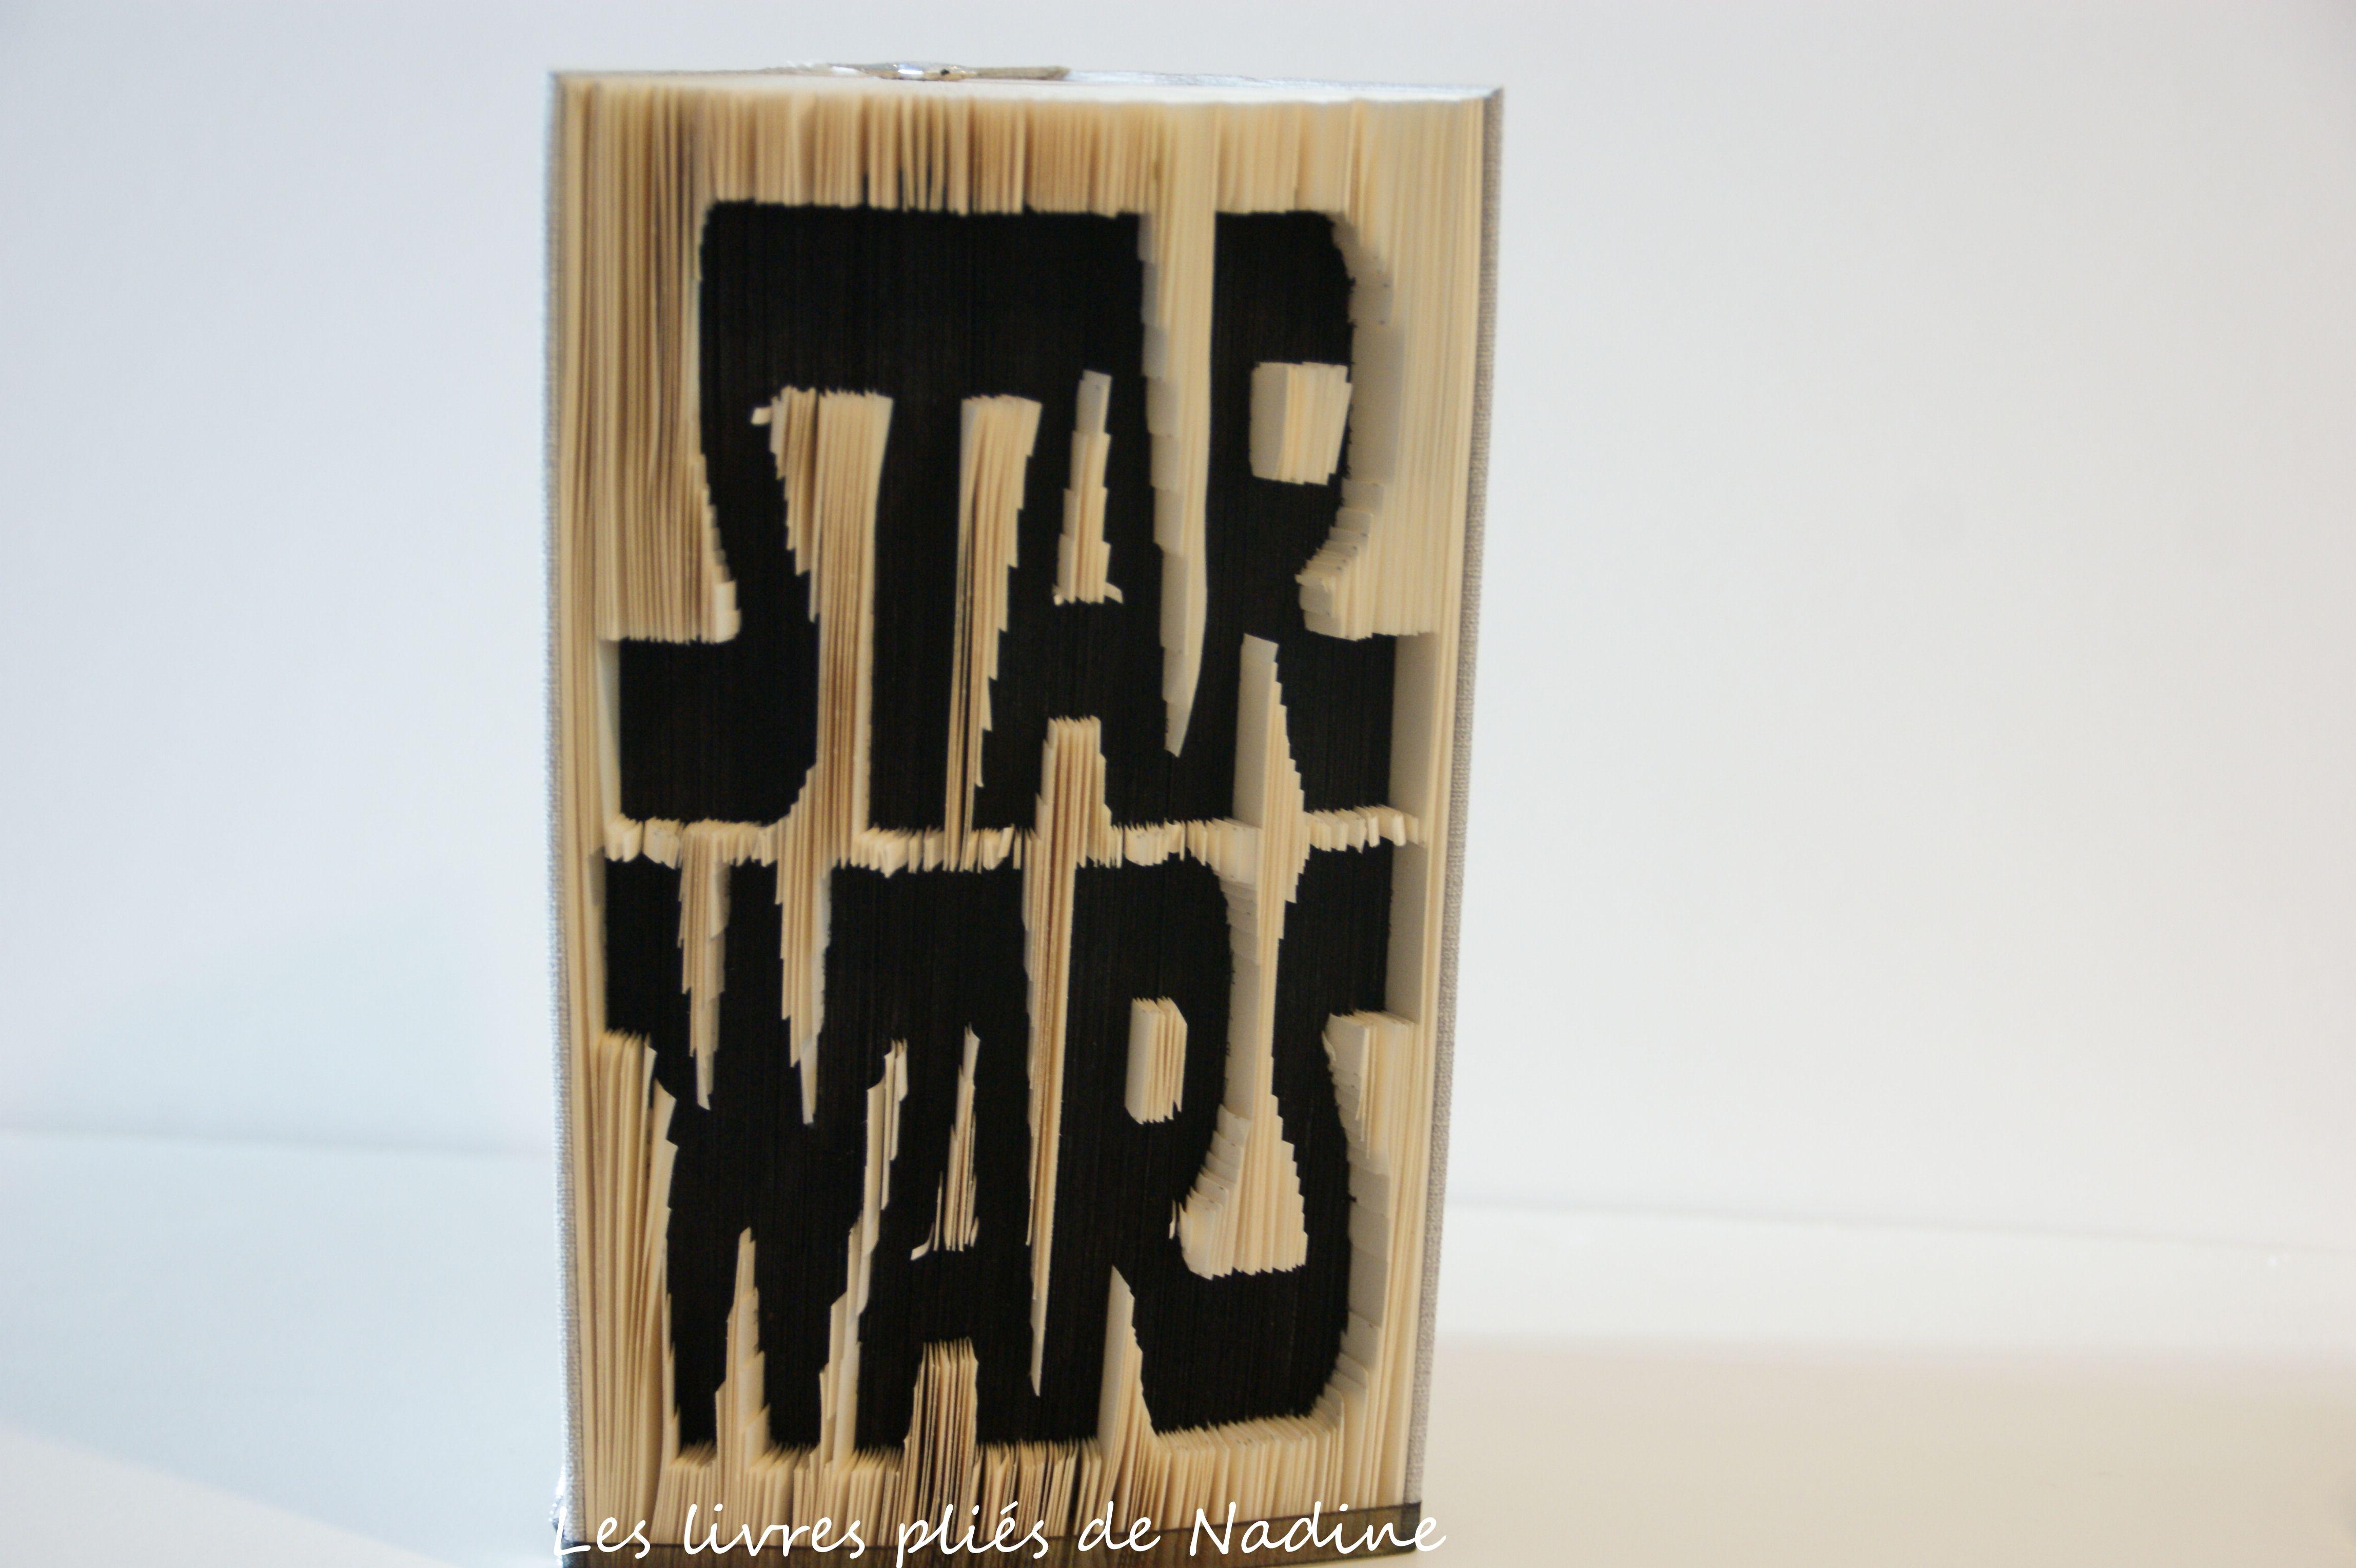 Decoup Pliage Star Wars Travail En Negatif Incruste Dans